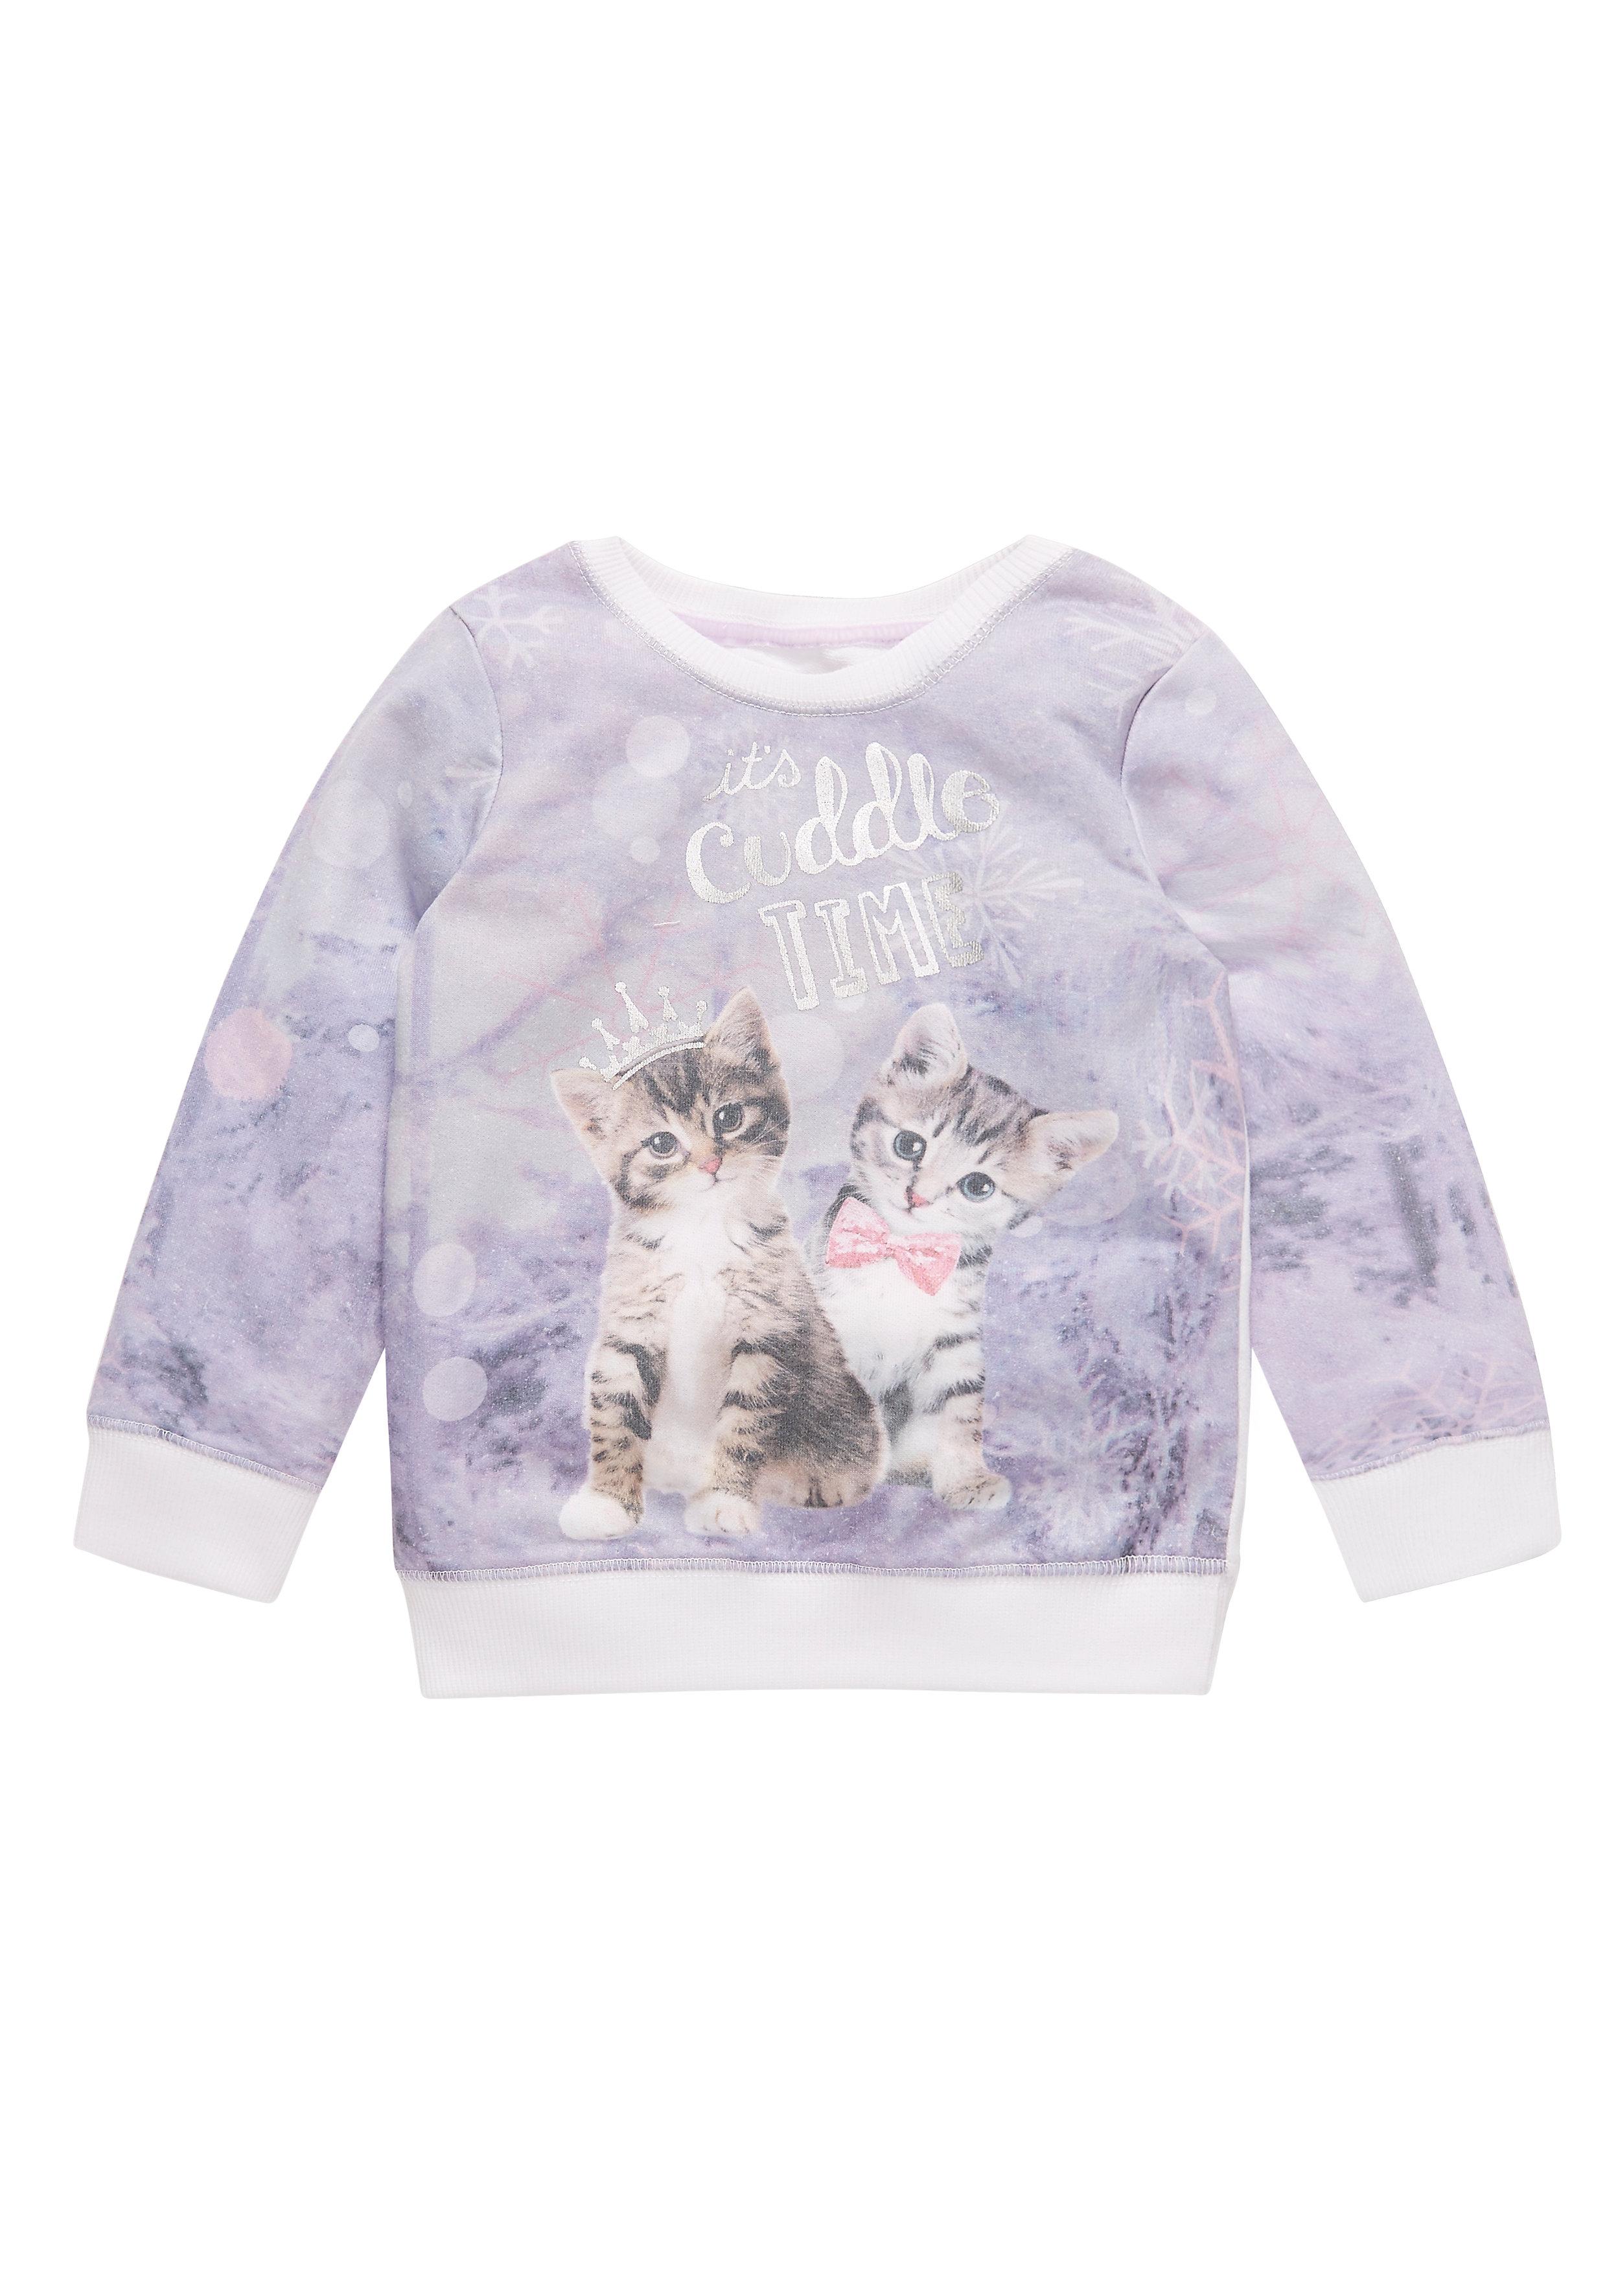 Mothercare | Girls Cat Sweat Top - Cream